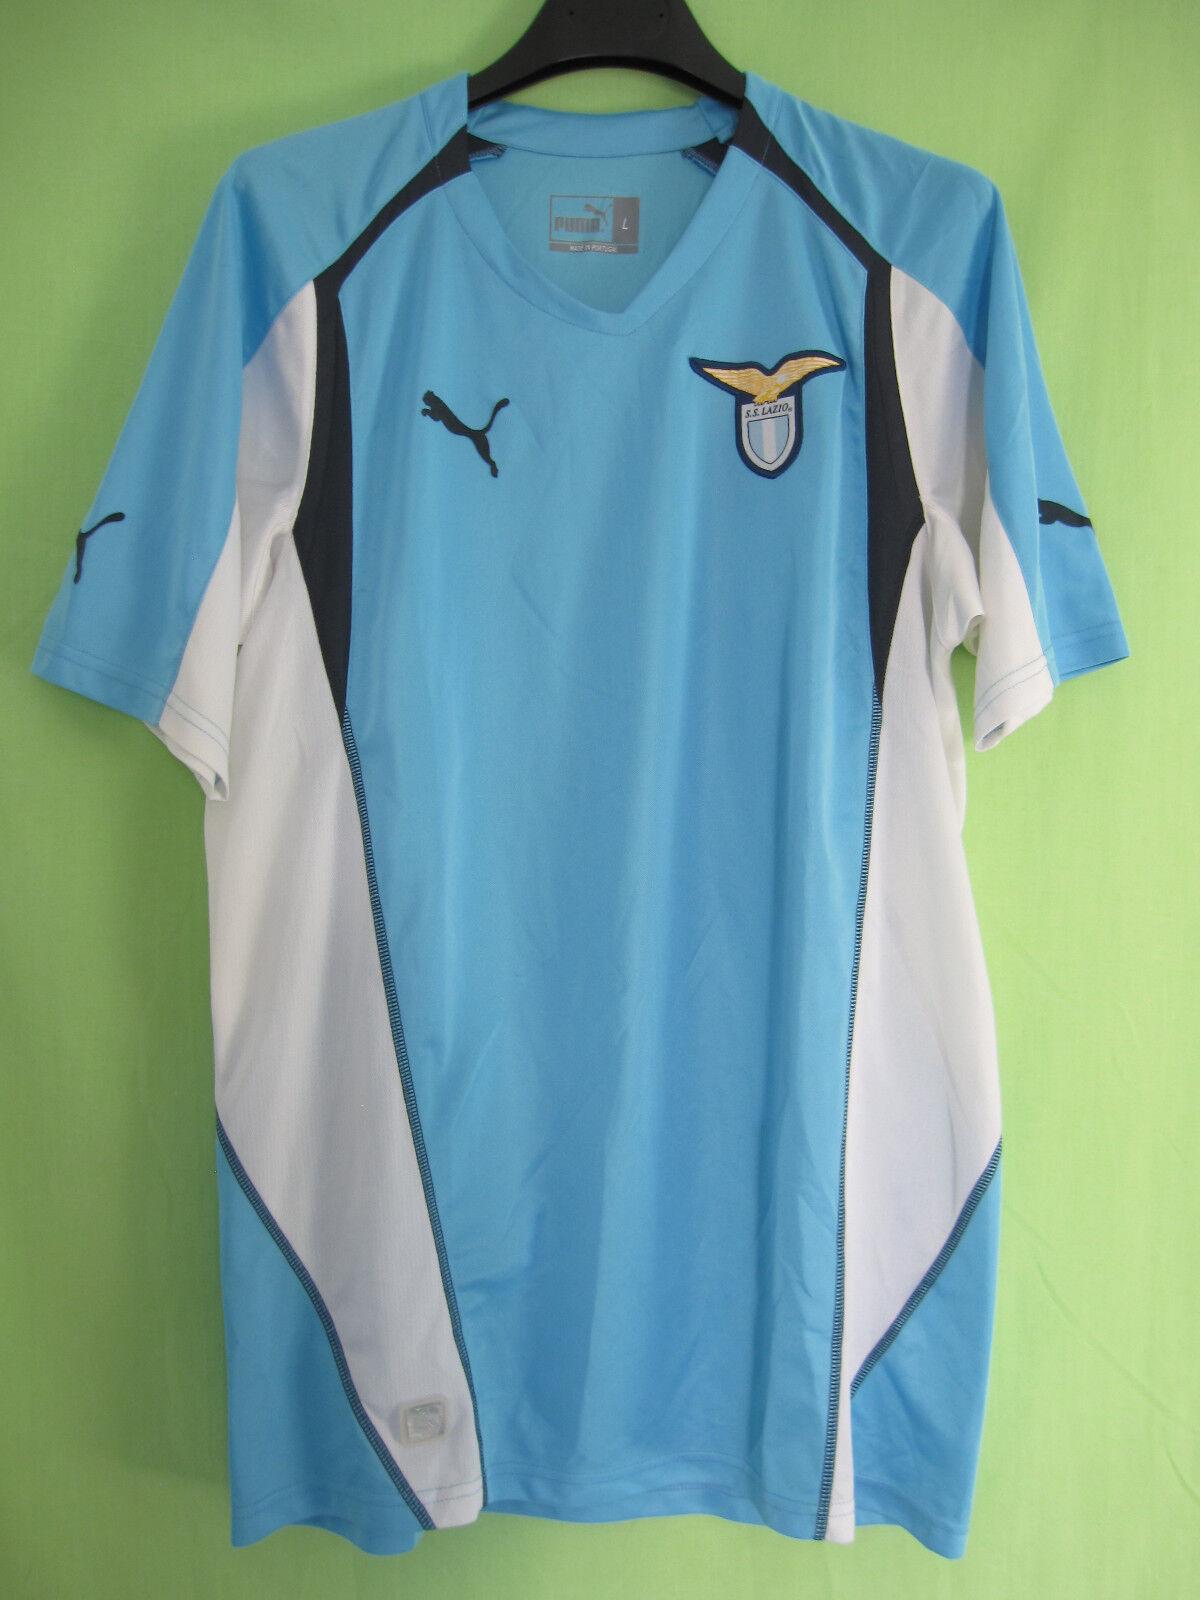 Maillot Lazio SS Lazio Maillot Puma vintage Football Soccer Shirt Entrainement Jersey - L b3f5e2